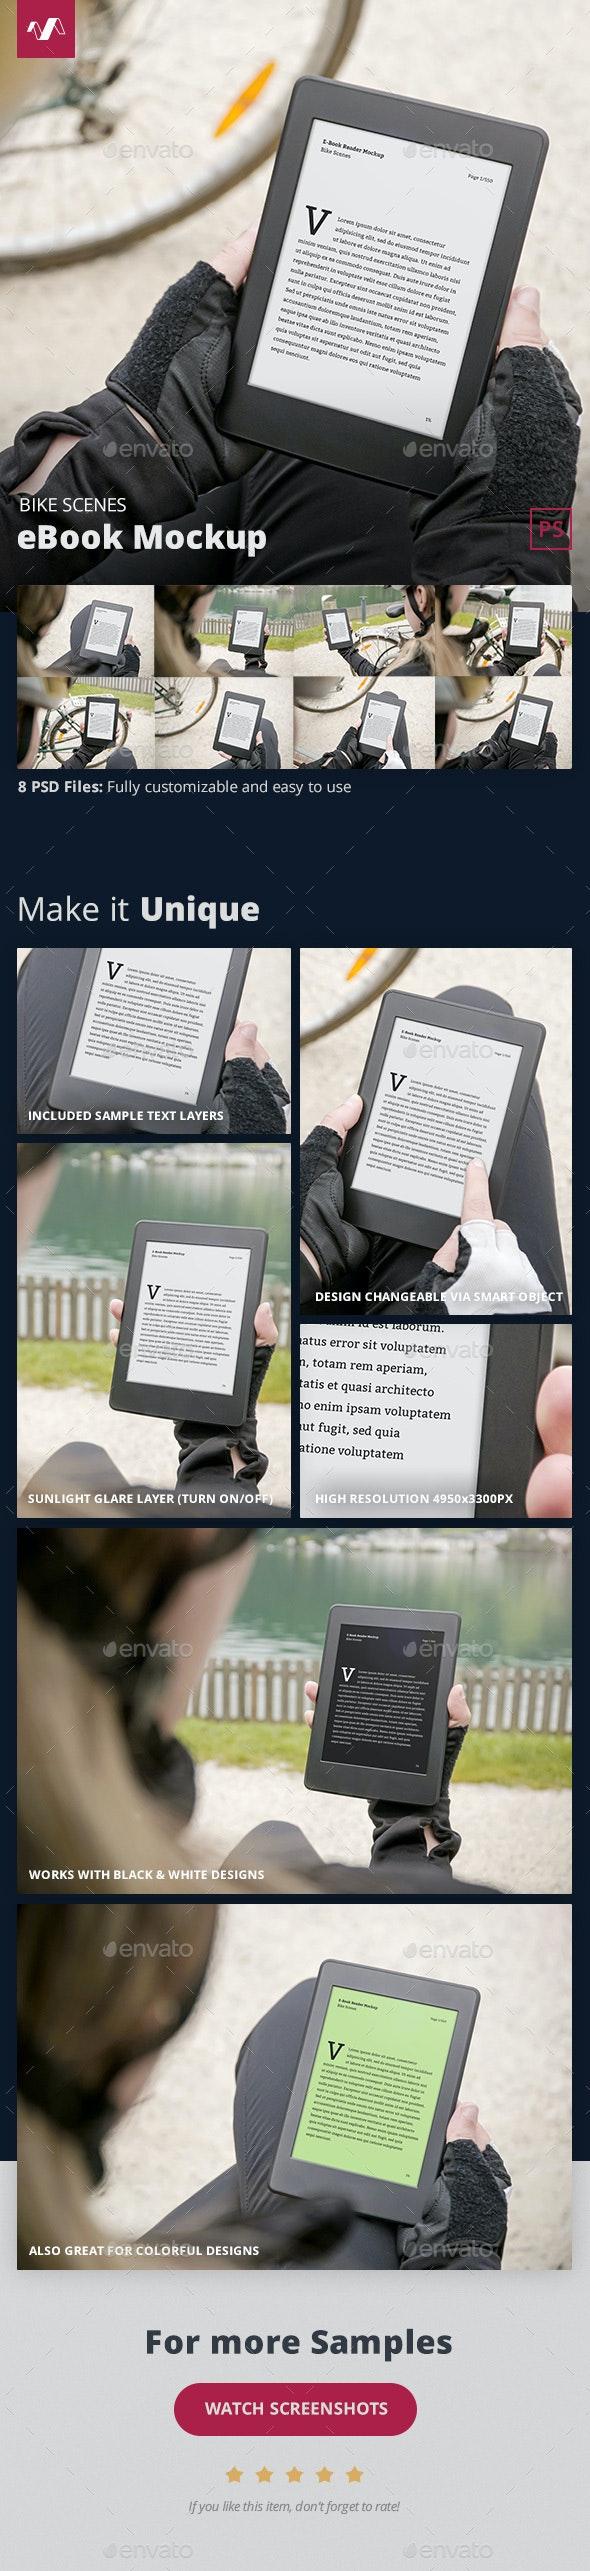 eBook Mockup Bike Scenes - Miscellaneous Displays